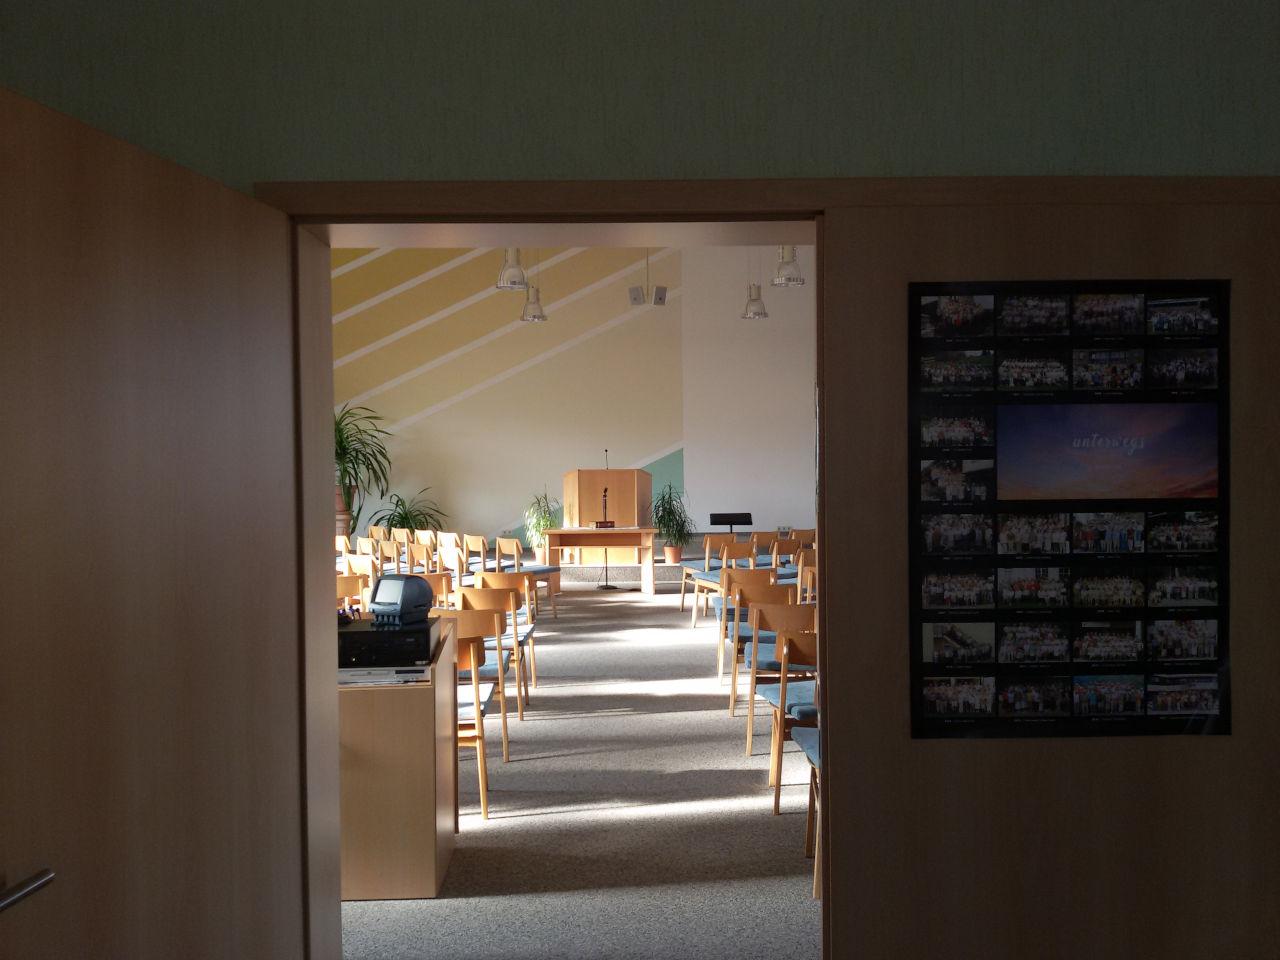 Eingang zum Saal